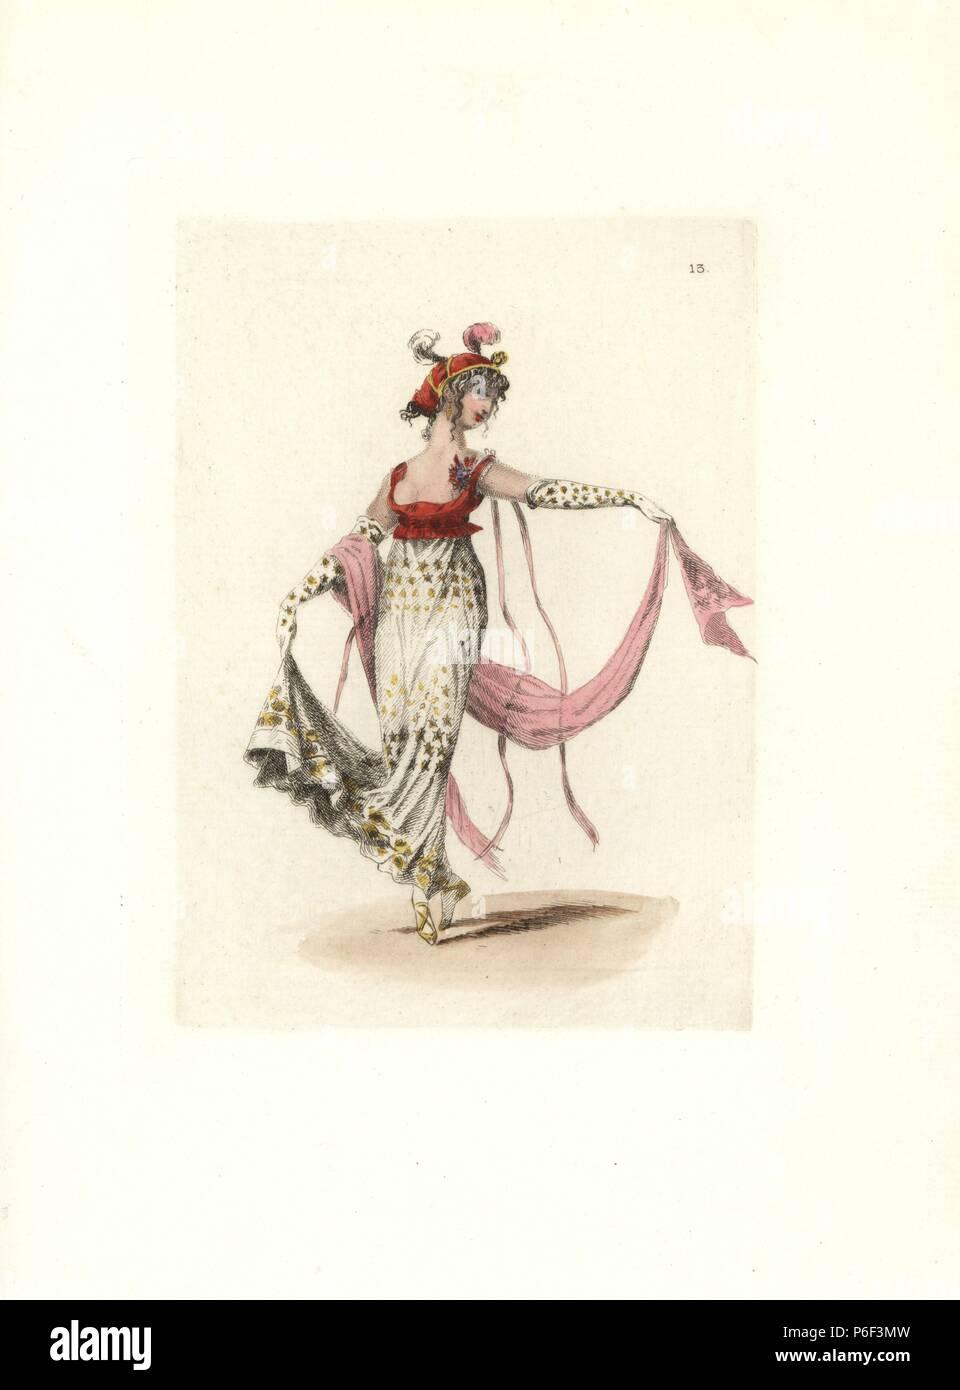 Ausgeschnittenes Stockfotosamp; Tief Tief Ausgeschnittenes Ausgeschnittenes Kleid Tief Rotes Rotes Stockfotosamp; Kleid ED9HW2I